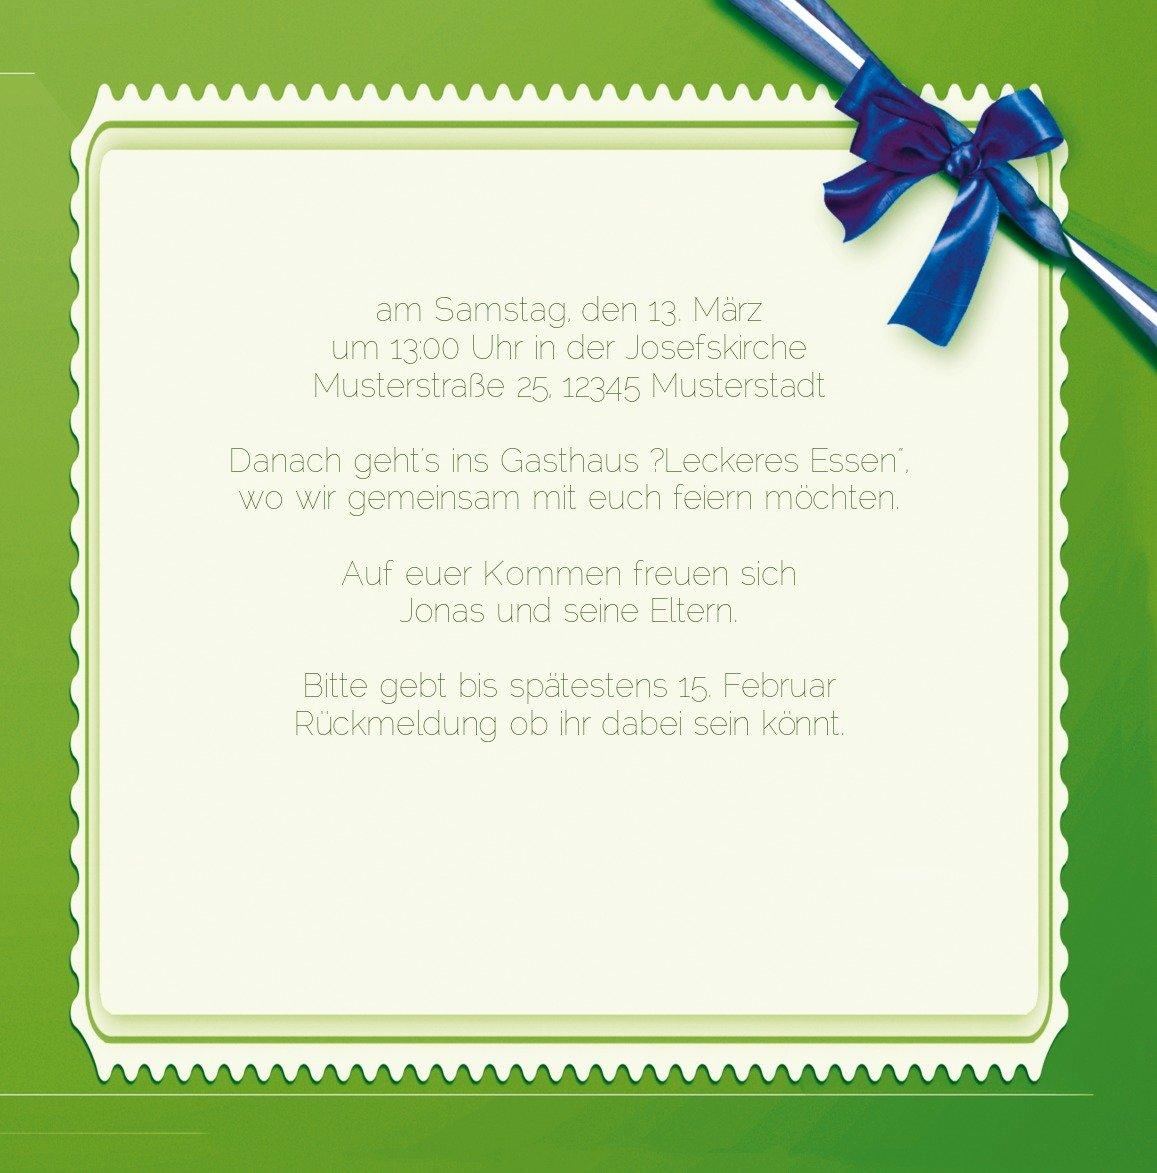 Kartenparadies Kartenparadies Kartenparadies Einladungskarte Taufeinladung Taufkarte Ribbon, hochwertige Einladung zur Taufe inklusive Umschläge   10 Karten - (Format  145x145 mm) Farbe  Rosalila B01MUGKRFA | Moderne Muster  | Genial  | Online Shop Europe  ea6d19